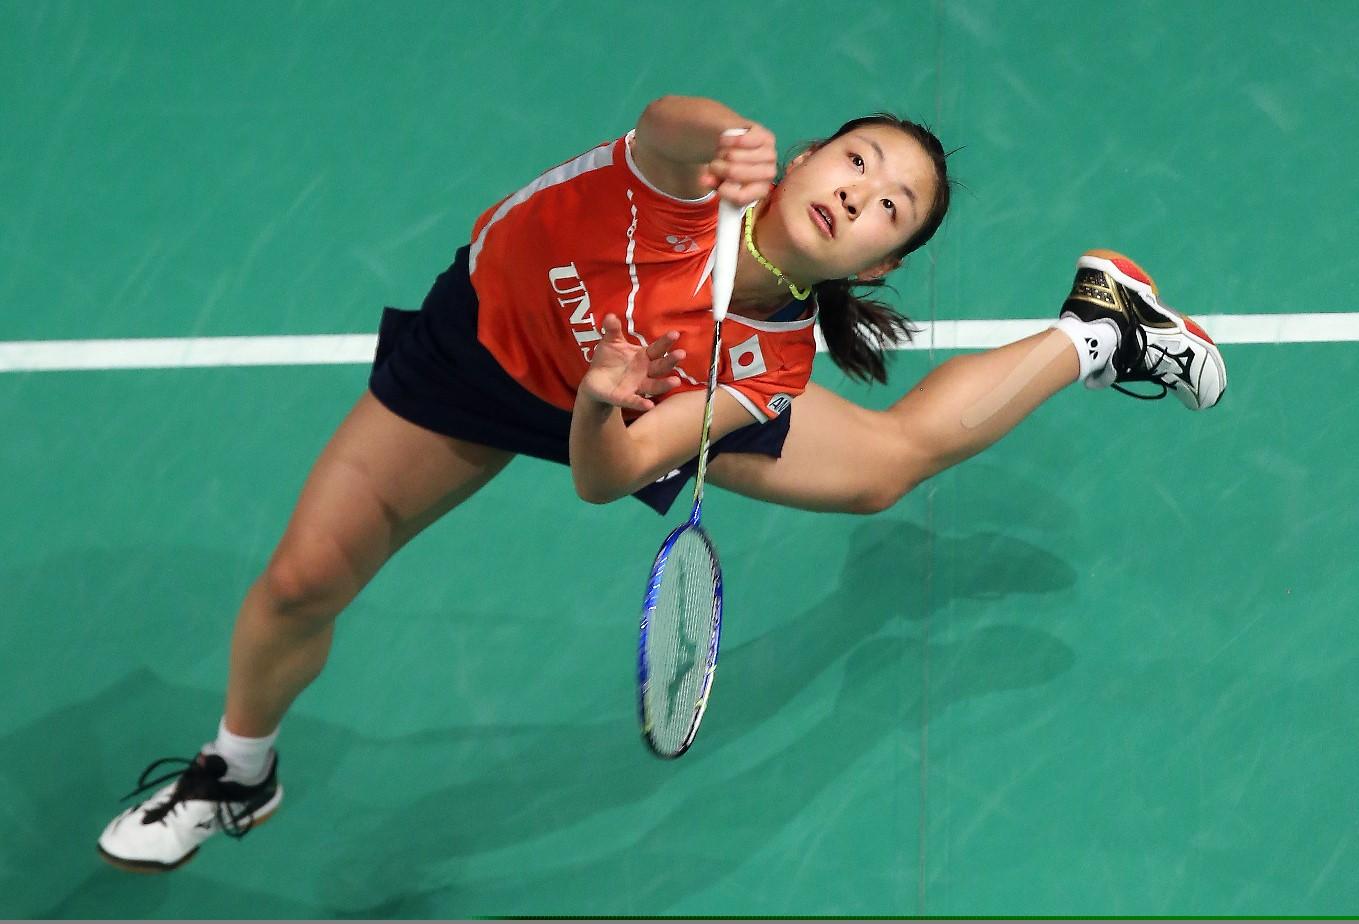 Australian Open 2016 - Day 2 - Nozomi Okuhara of Japan